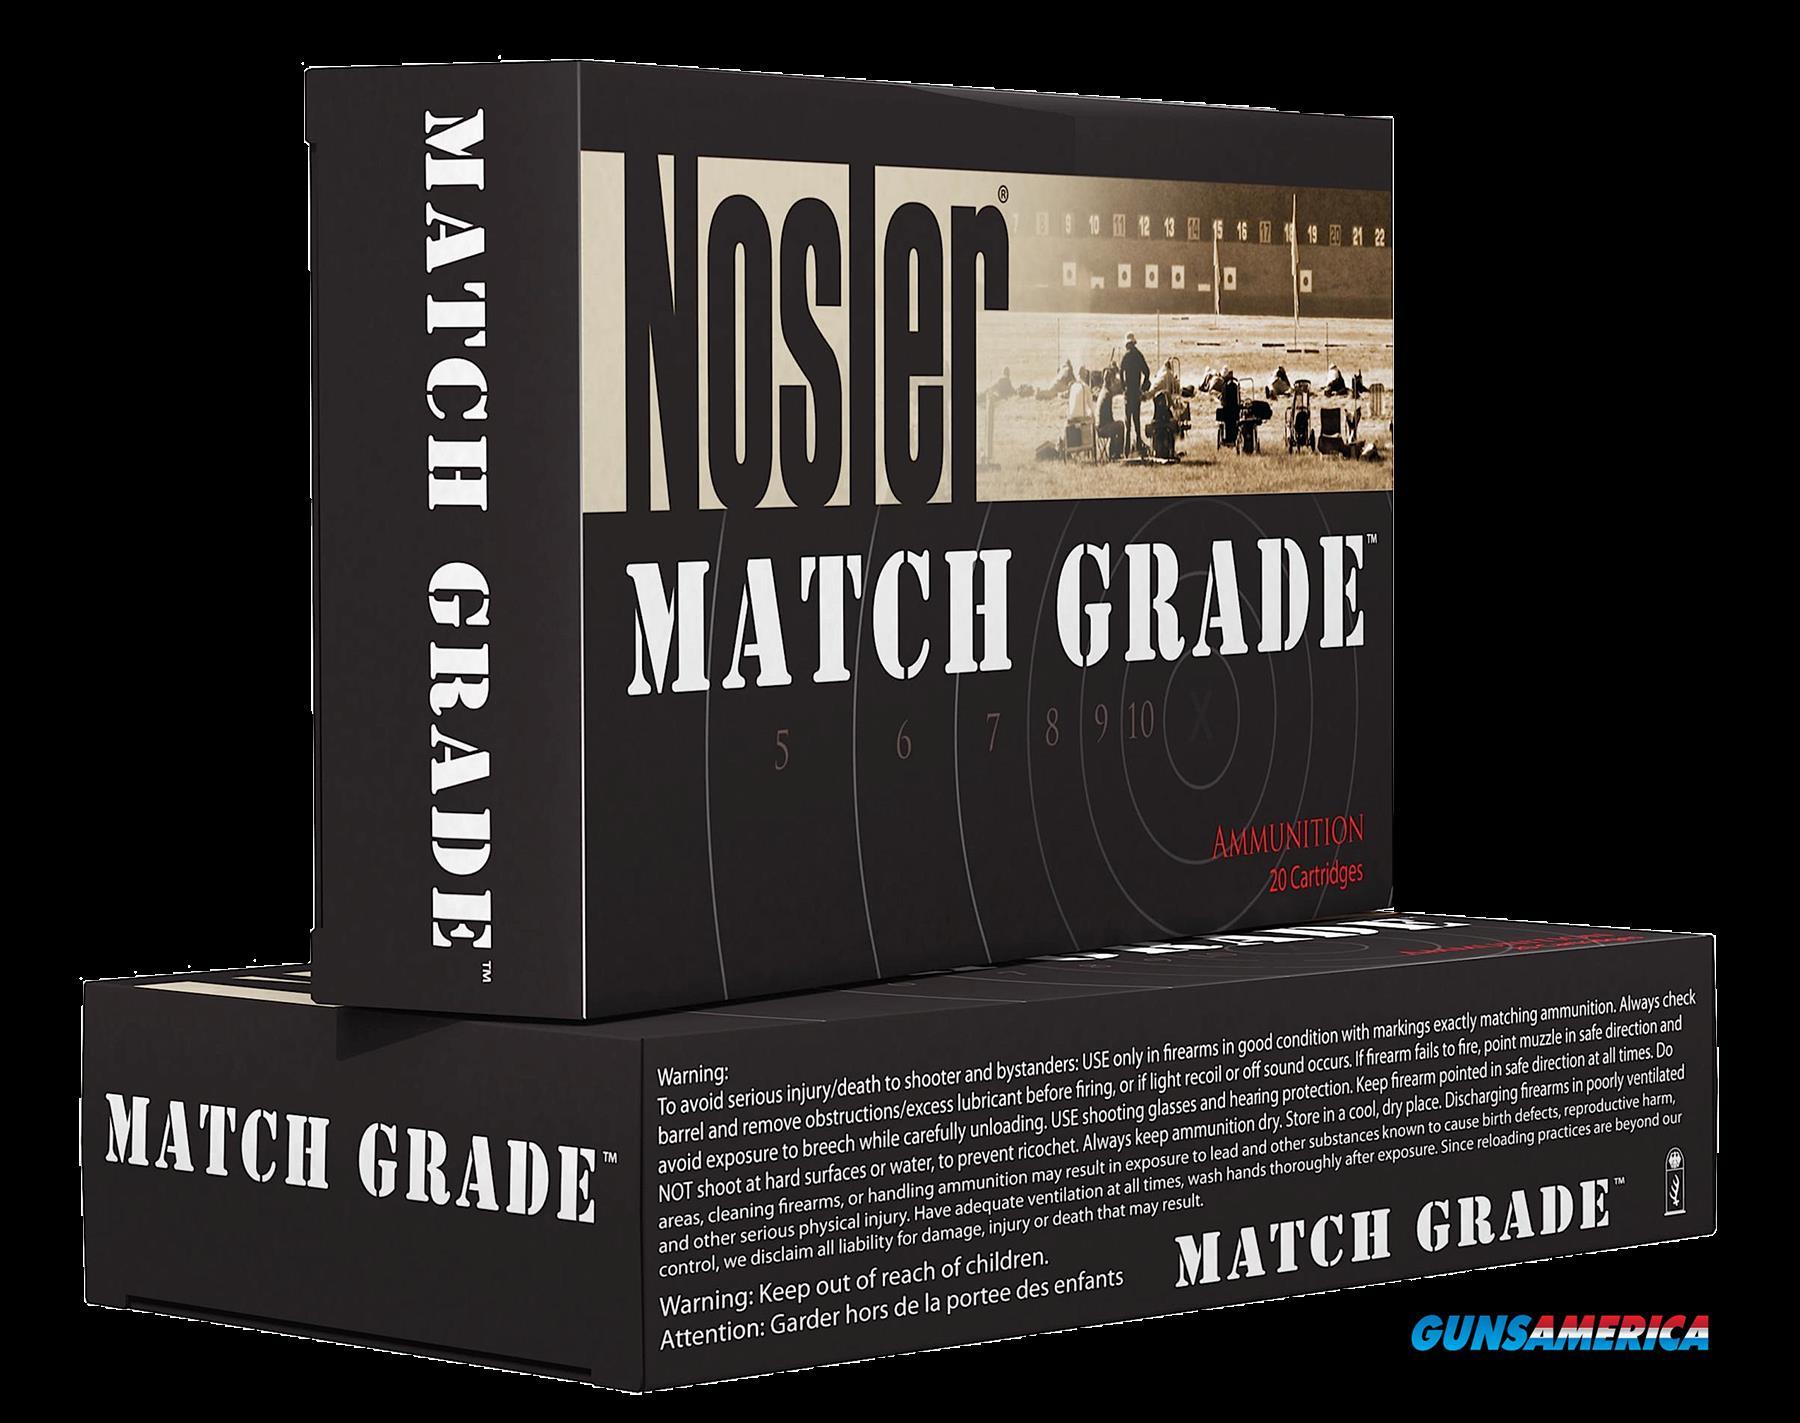 Nosler Match Grade, Nos 43136 Cc 338lap Match 300 Hp             20-10  Guns > Pistols > 1911 Pistol Copies (non-Colt)